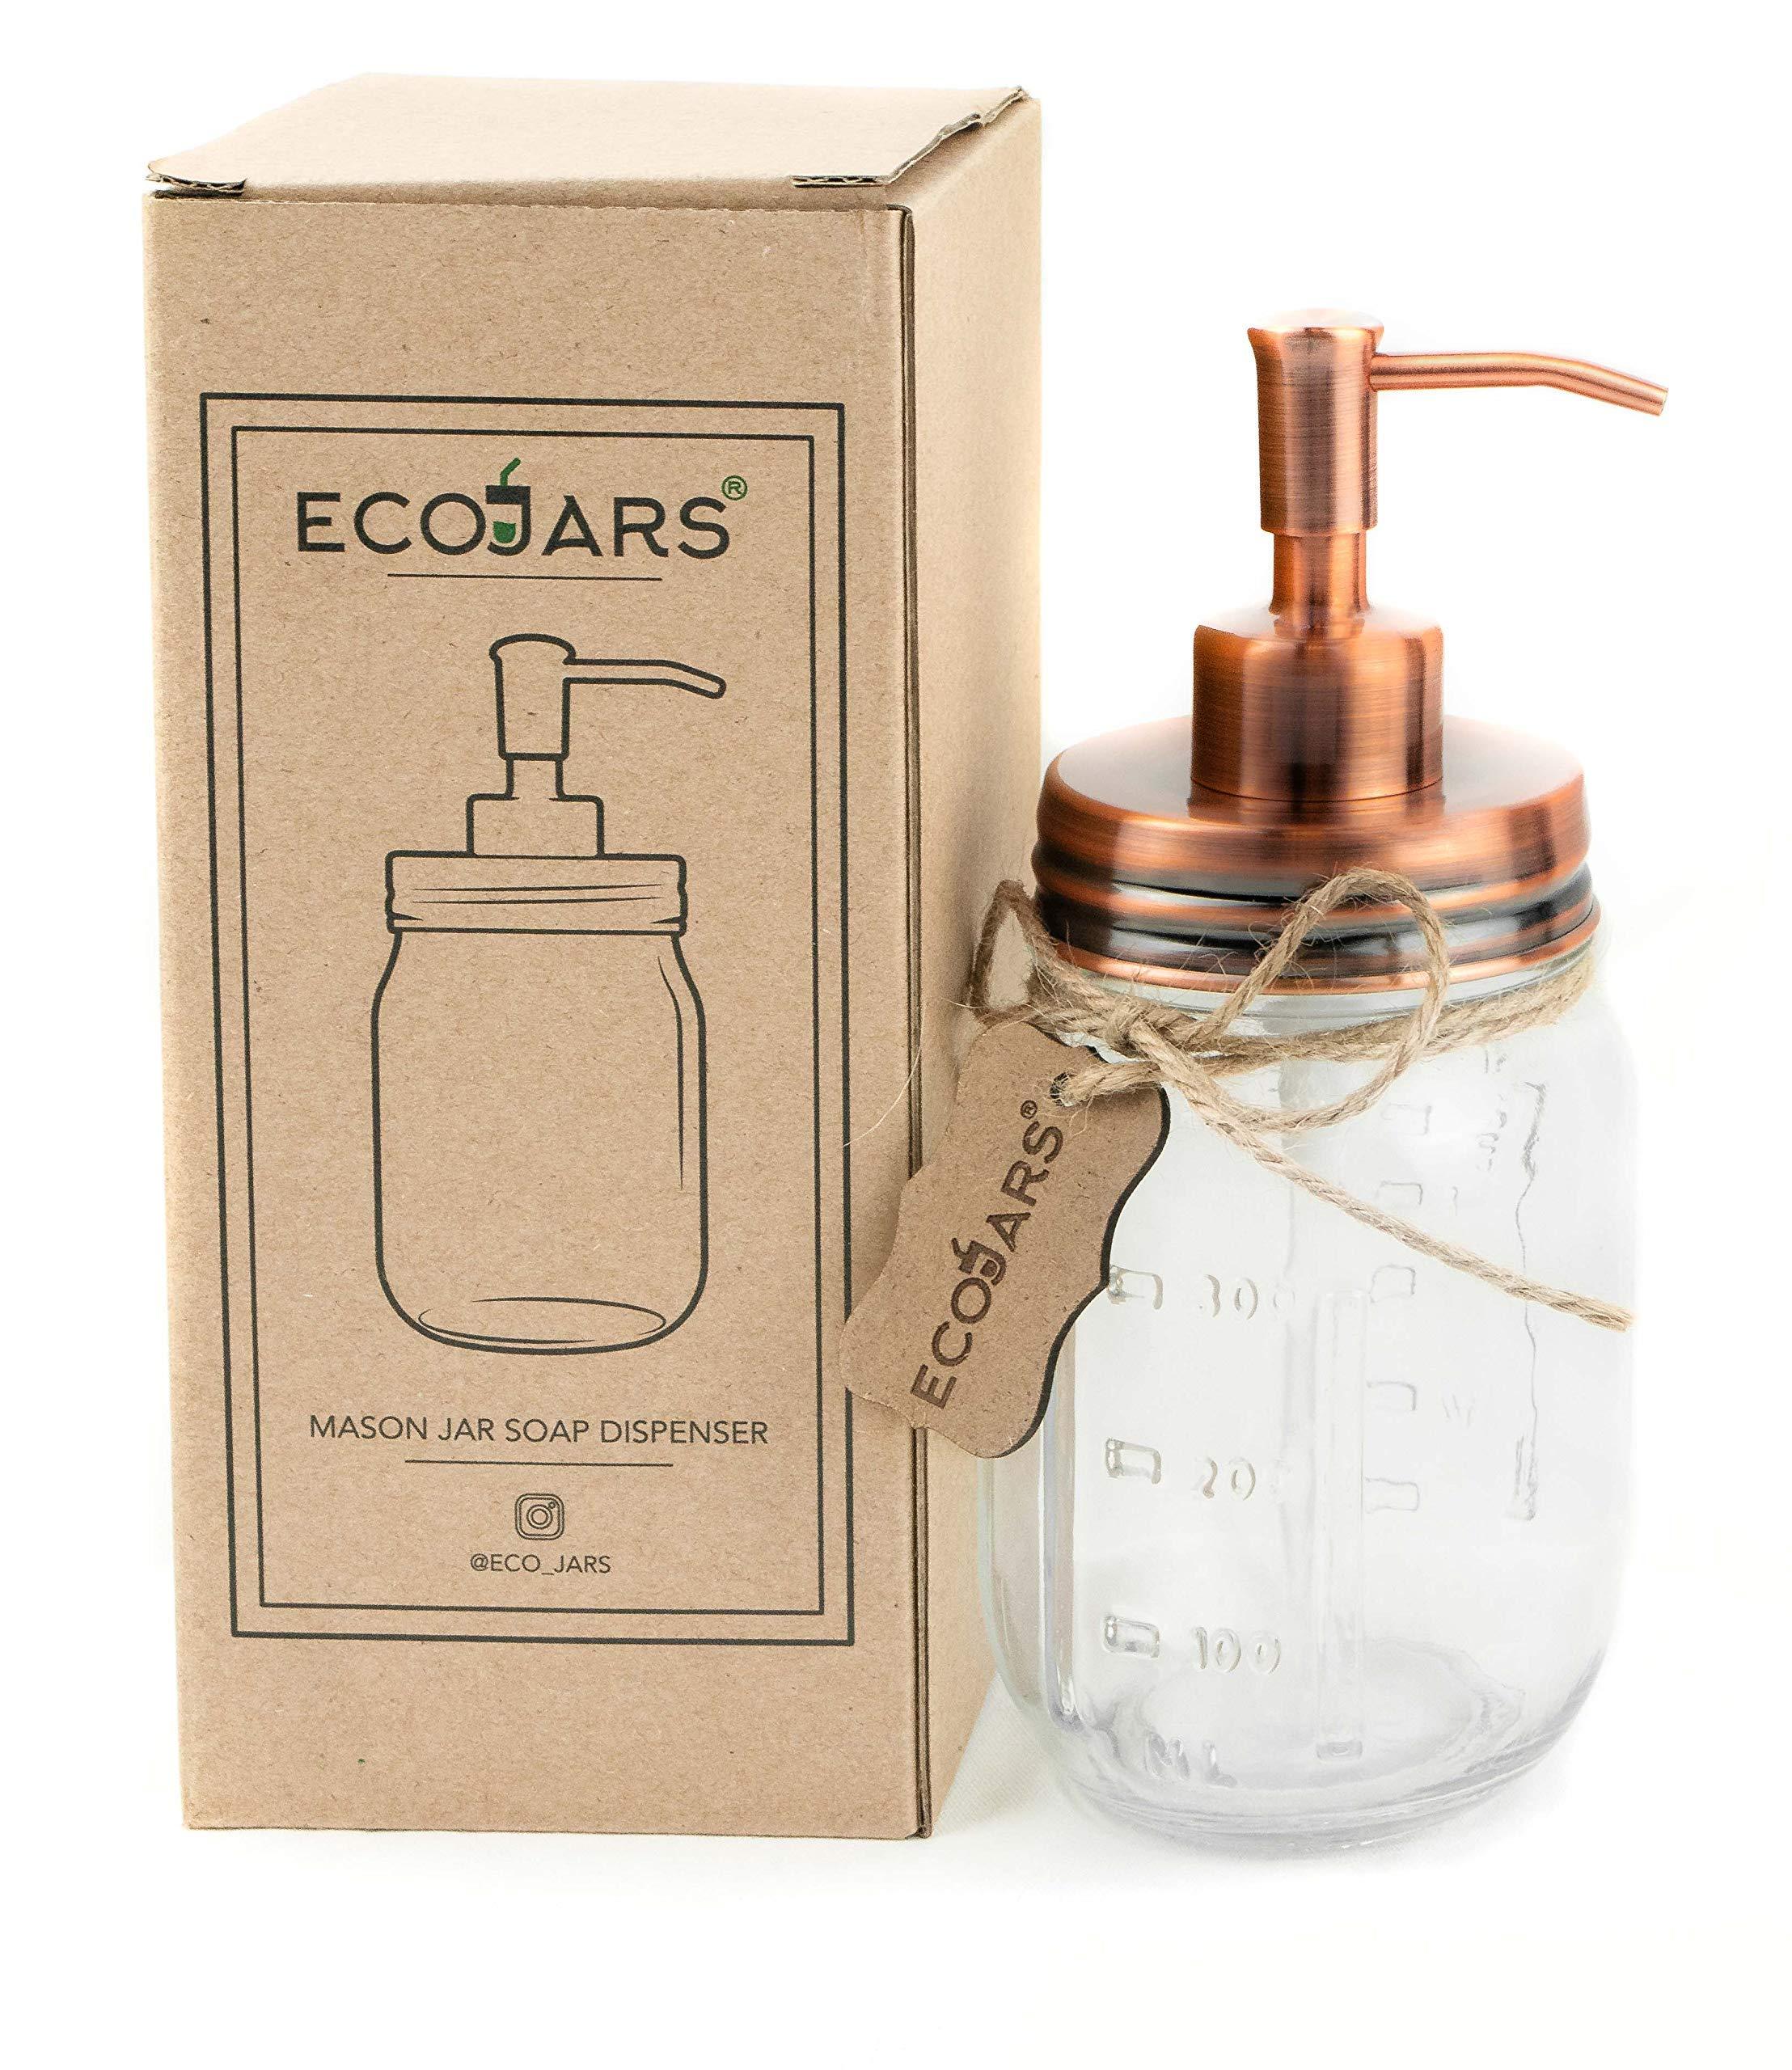 NEW COPPER,ROSE GOLD PUMP+GLASS VINTAGE STYLE BATHROOM,KITCHEN SOAP DISPENSER